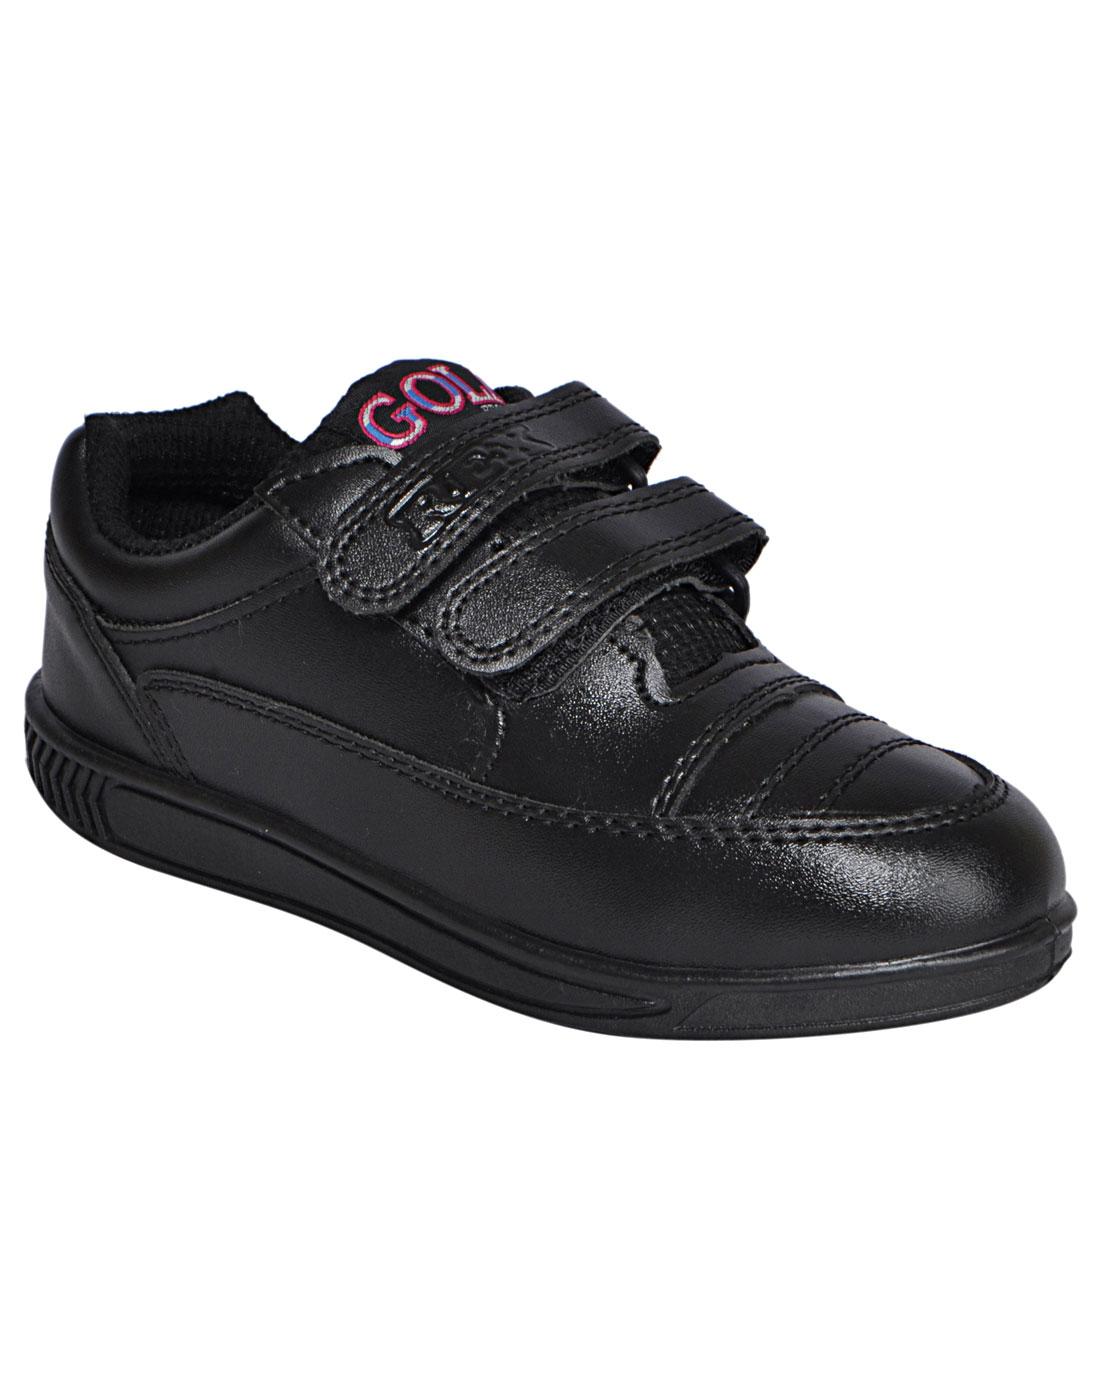 Gola Black School Shoes